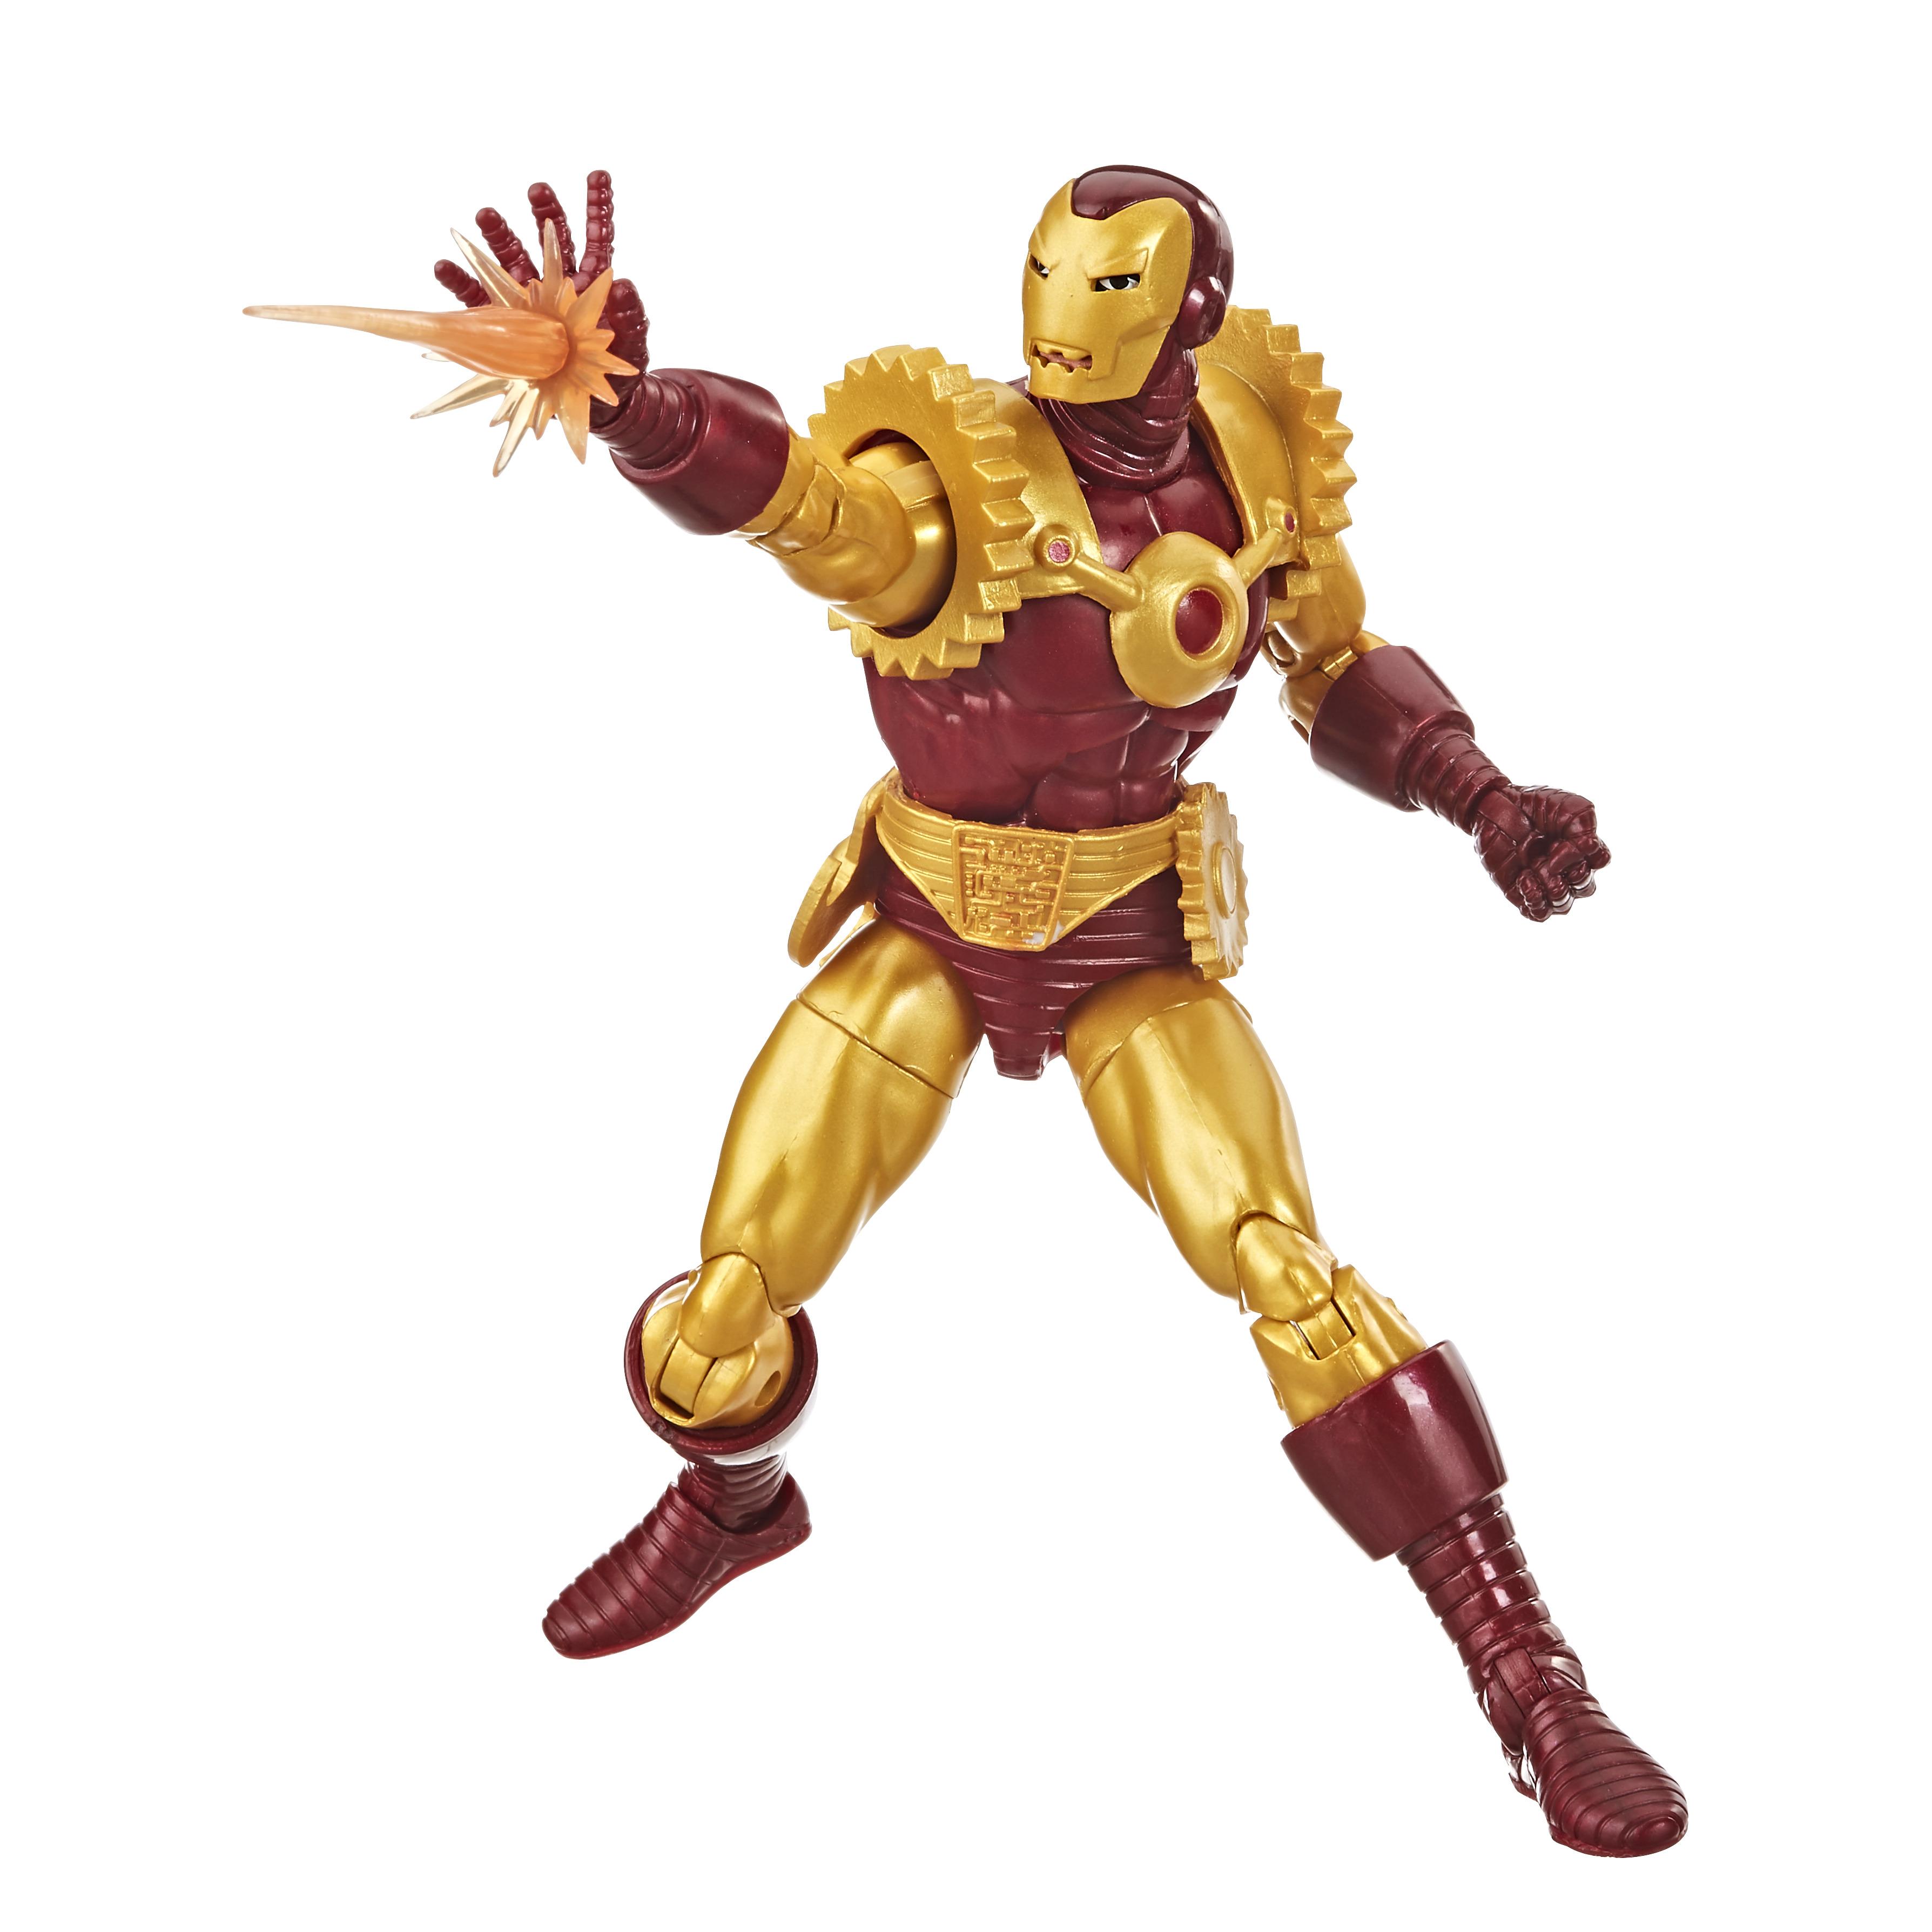 E87085L00 Marvel Legends Iron Man 2020 main detail